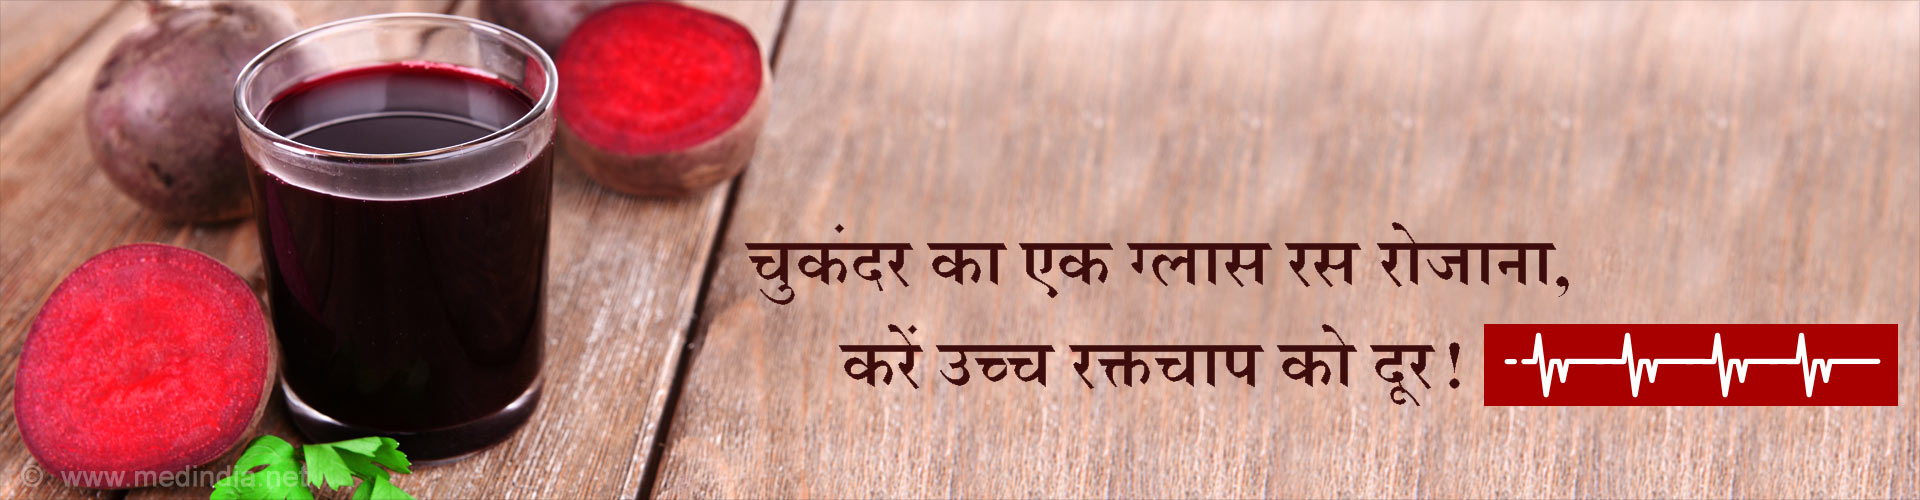 चुकंदर का एक ग्लास रस,  हर रोज पीजियेे , उच्च रक्तचाप को दूर कीजियेे।